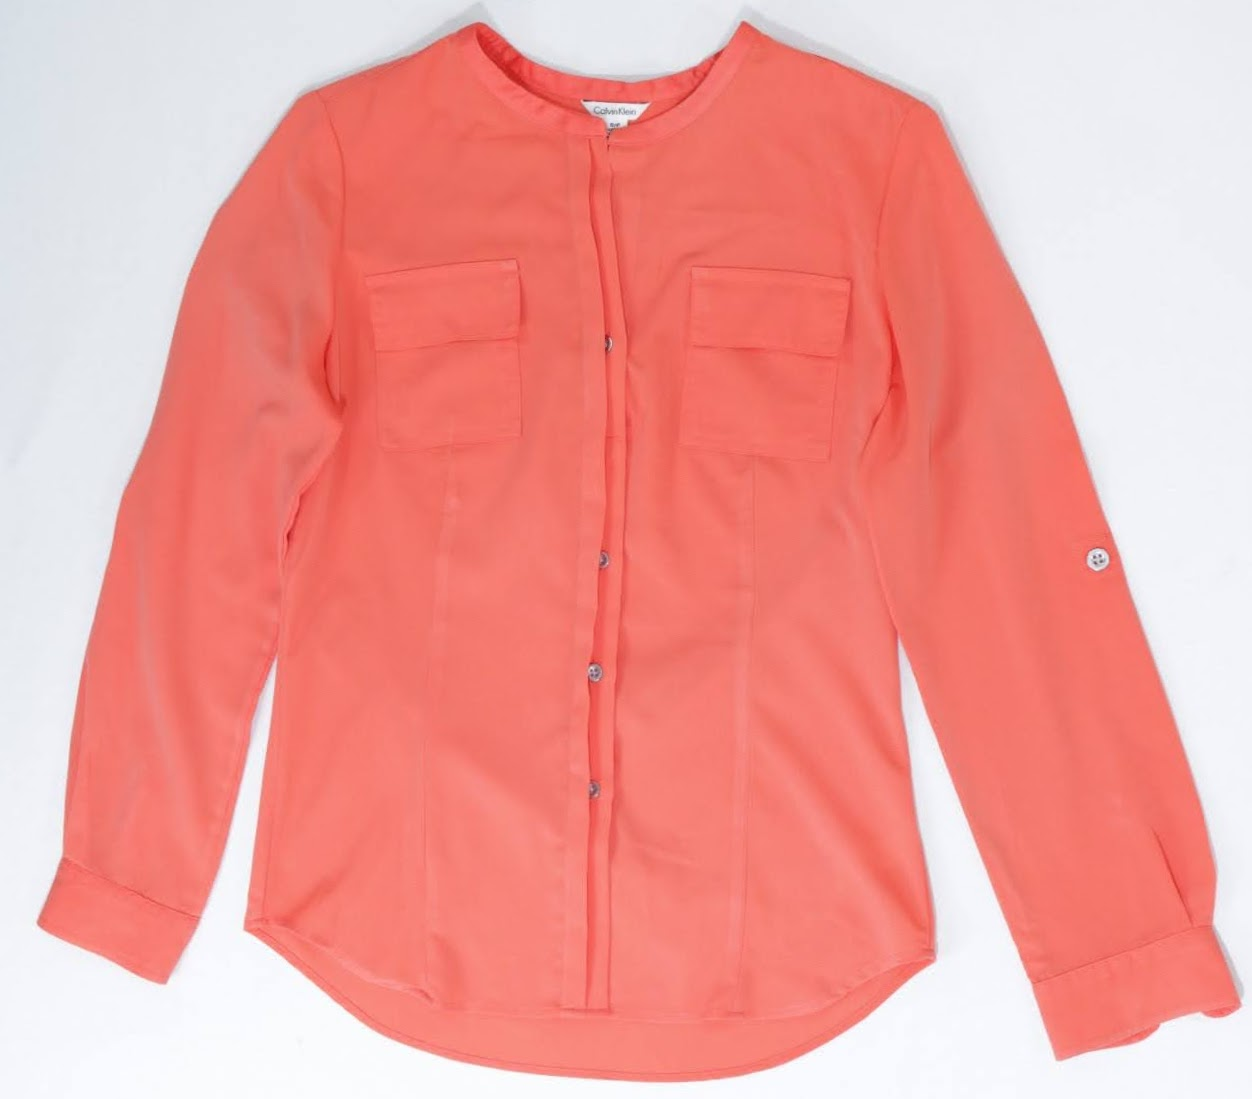 Camisa Calvin Klein - Tam P